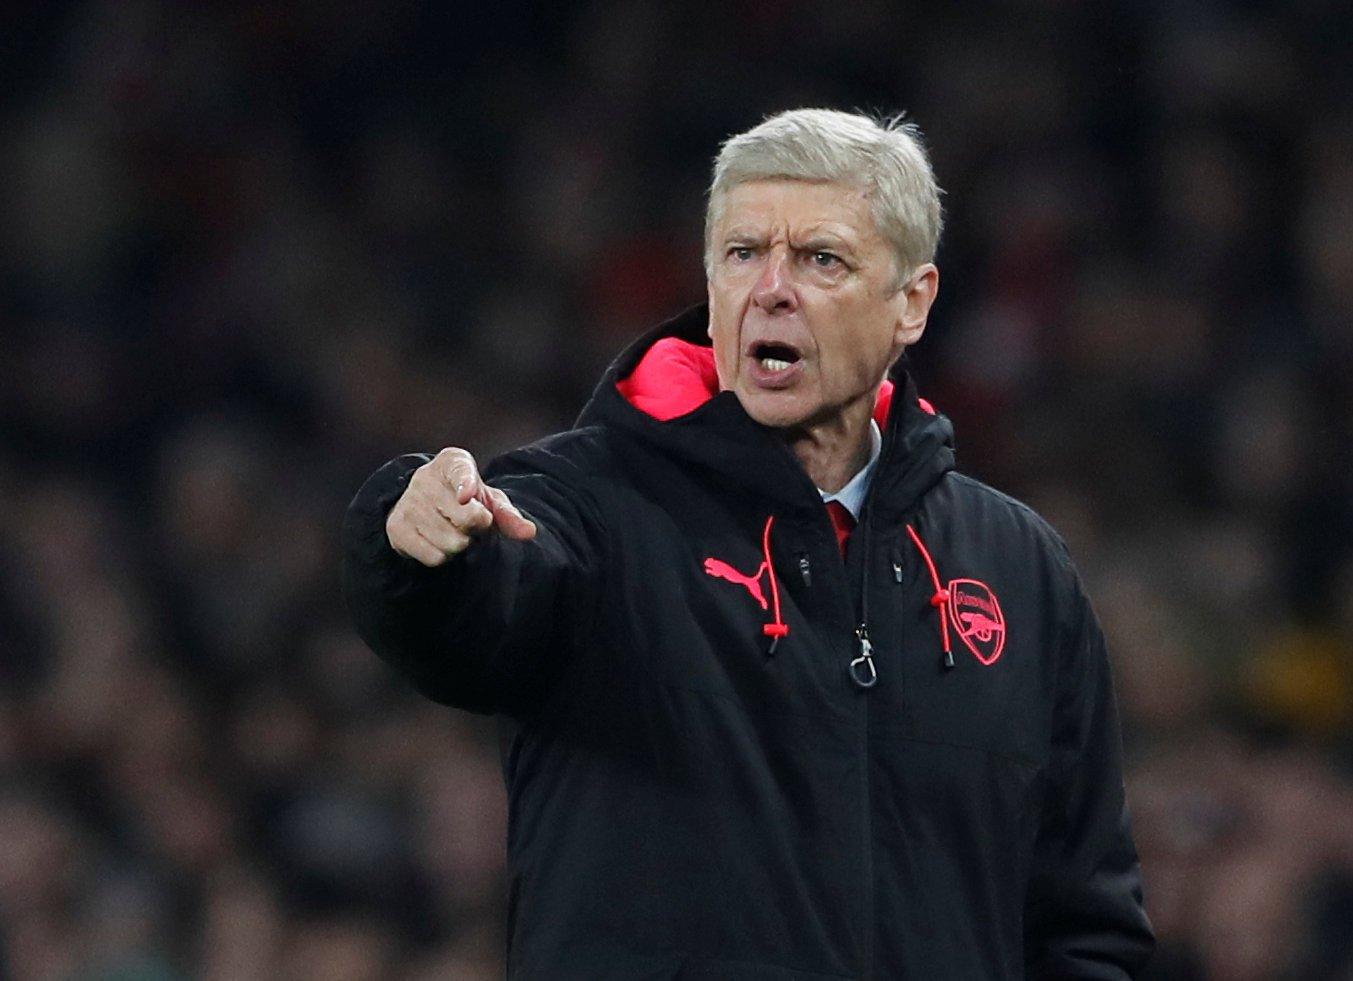 Arsene Wenger encouraged to make a move for Leon Goretzka by new Arsenal talent spotter Sven Mislintat